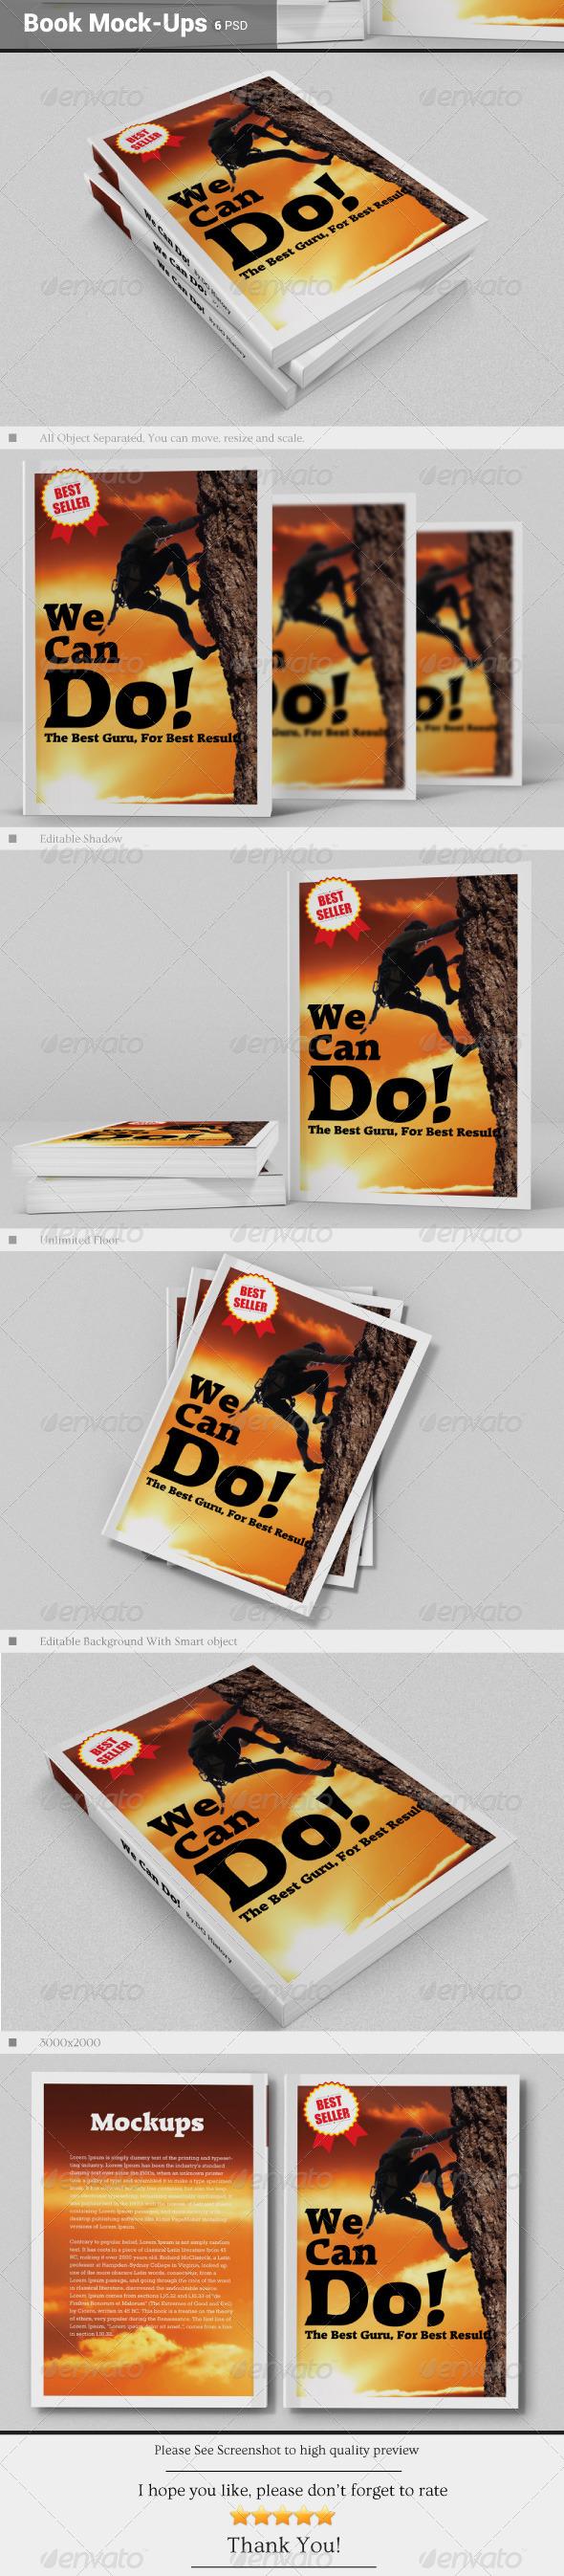 GraphicRiver Book Mock-Ups 6539351